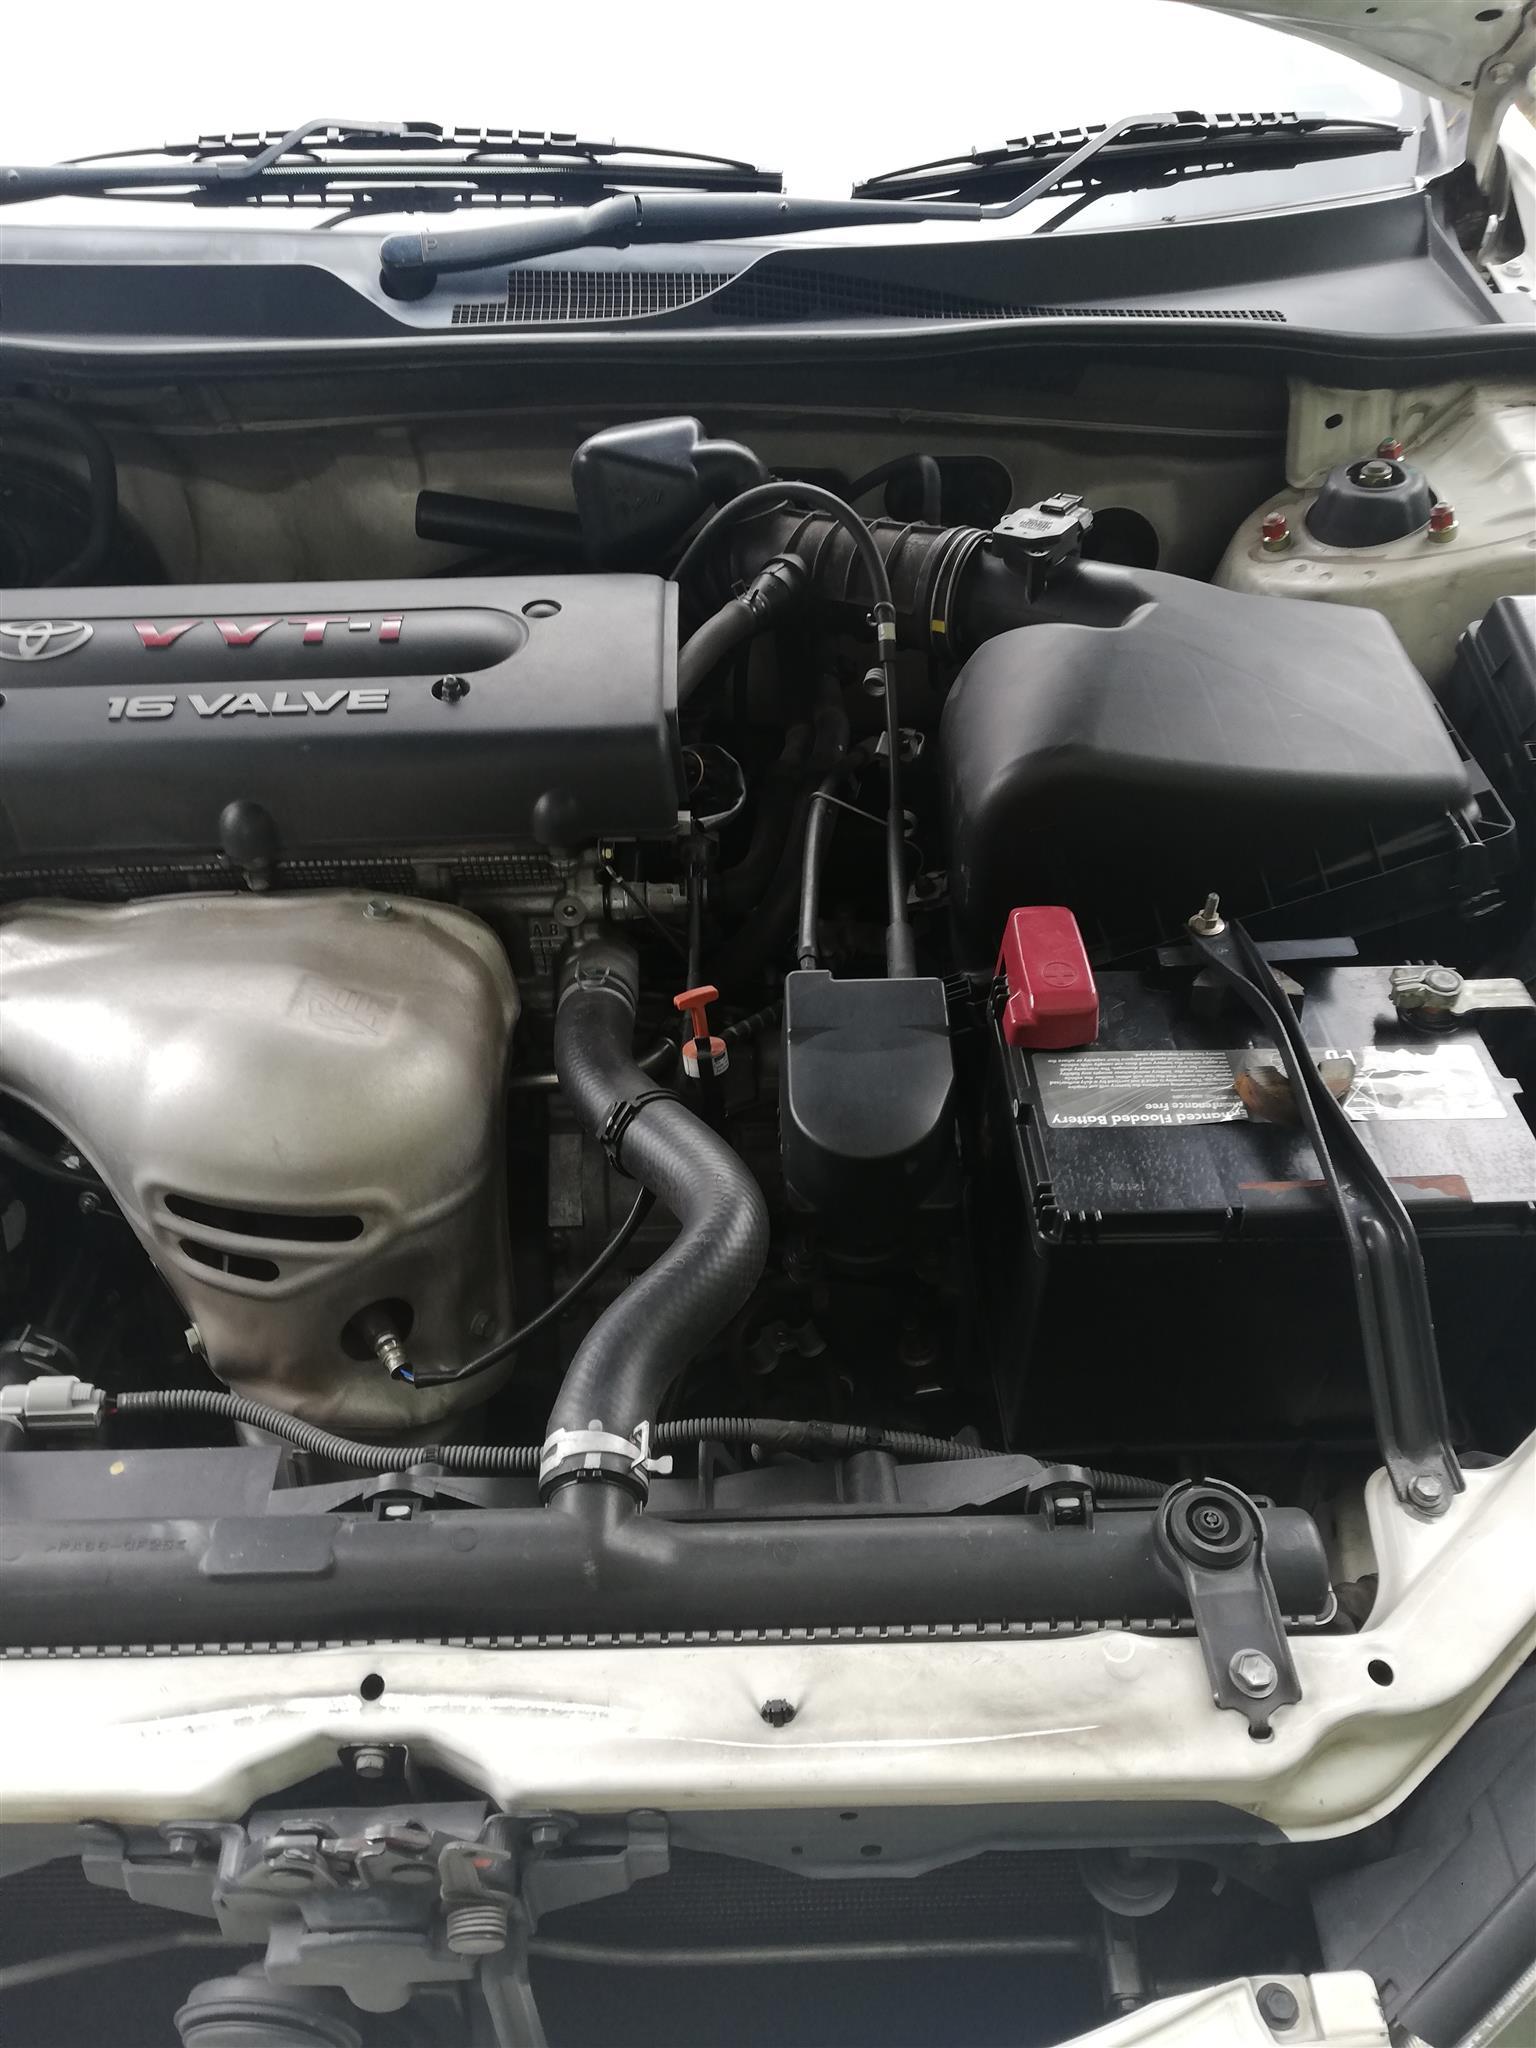 2005 Toyota Camry 2.4 XLi